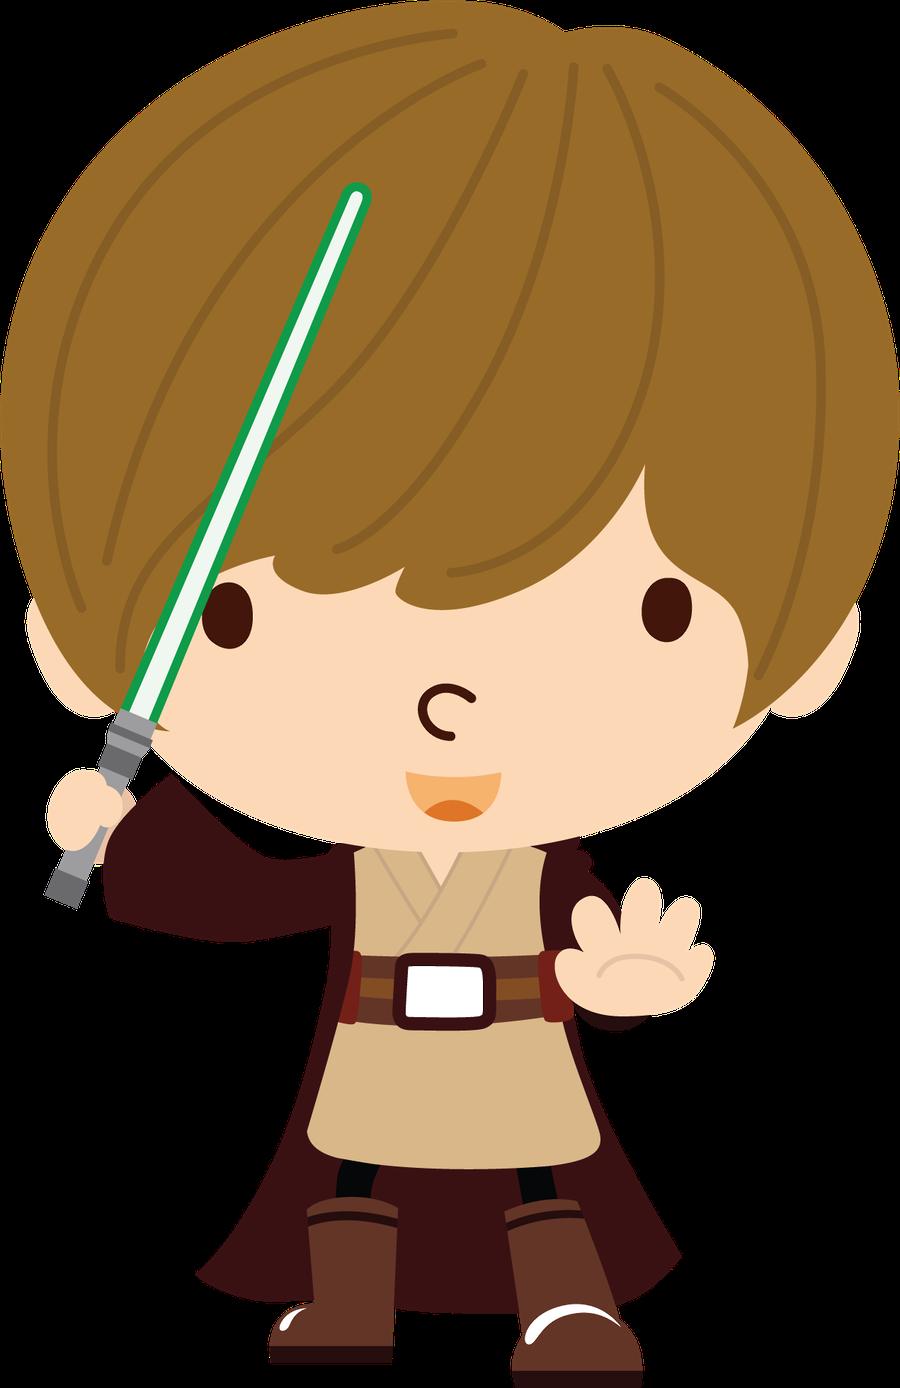 Princess Leia clipart Pinterest Star Wars*** Wars Planner